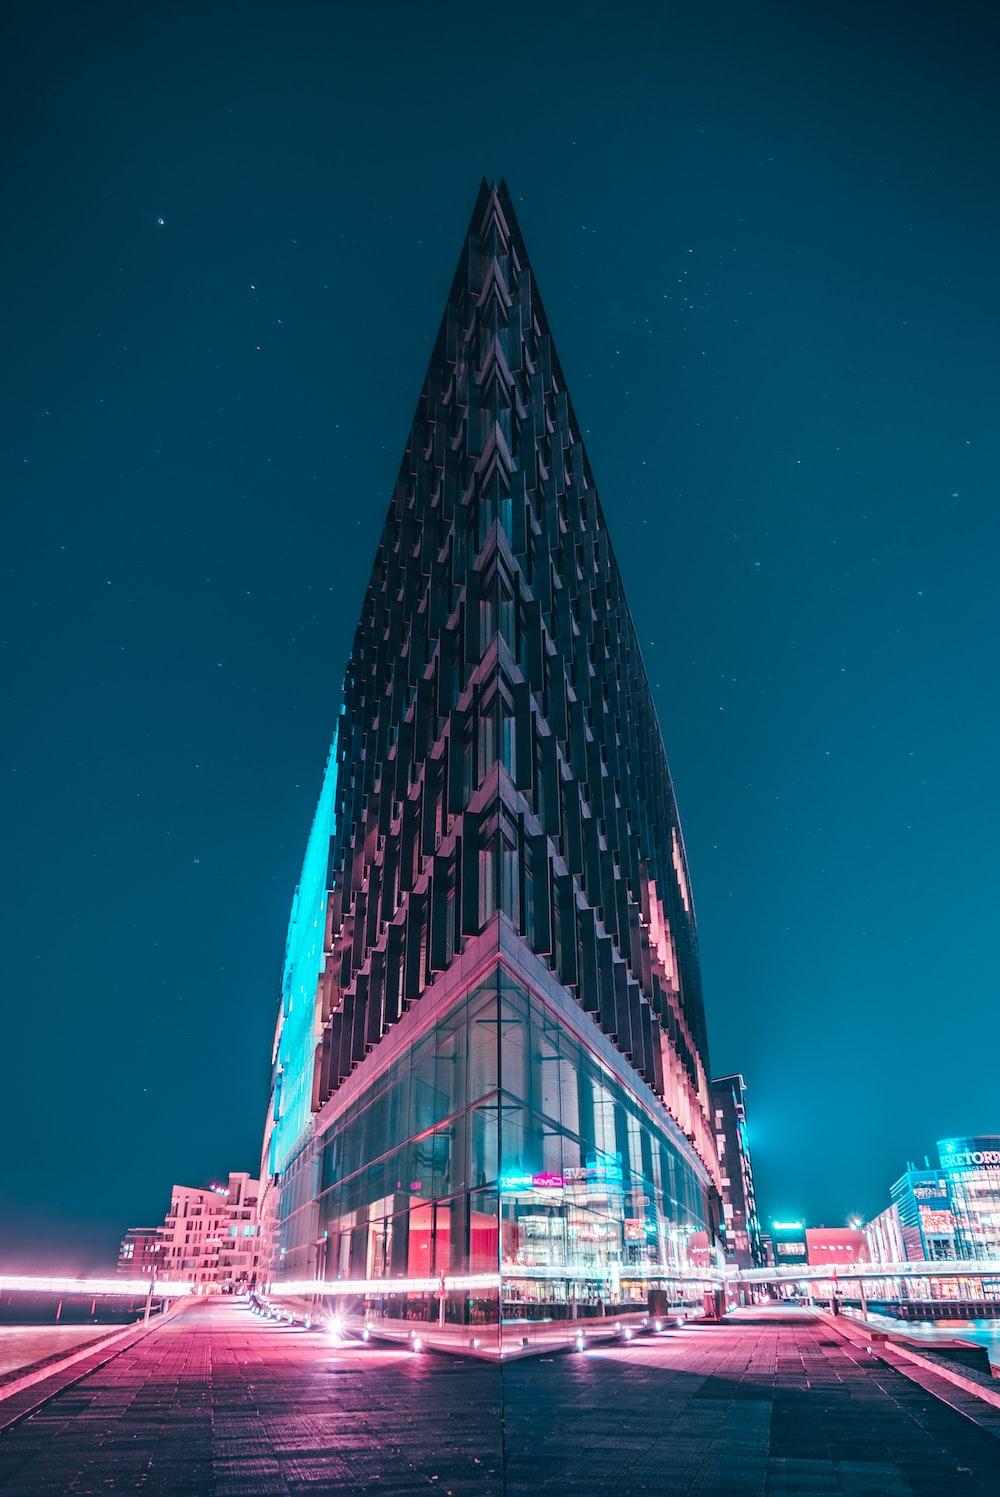 gray concrete building under starry night